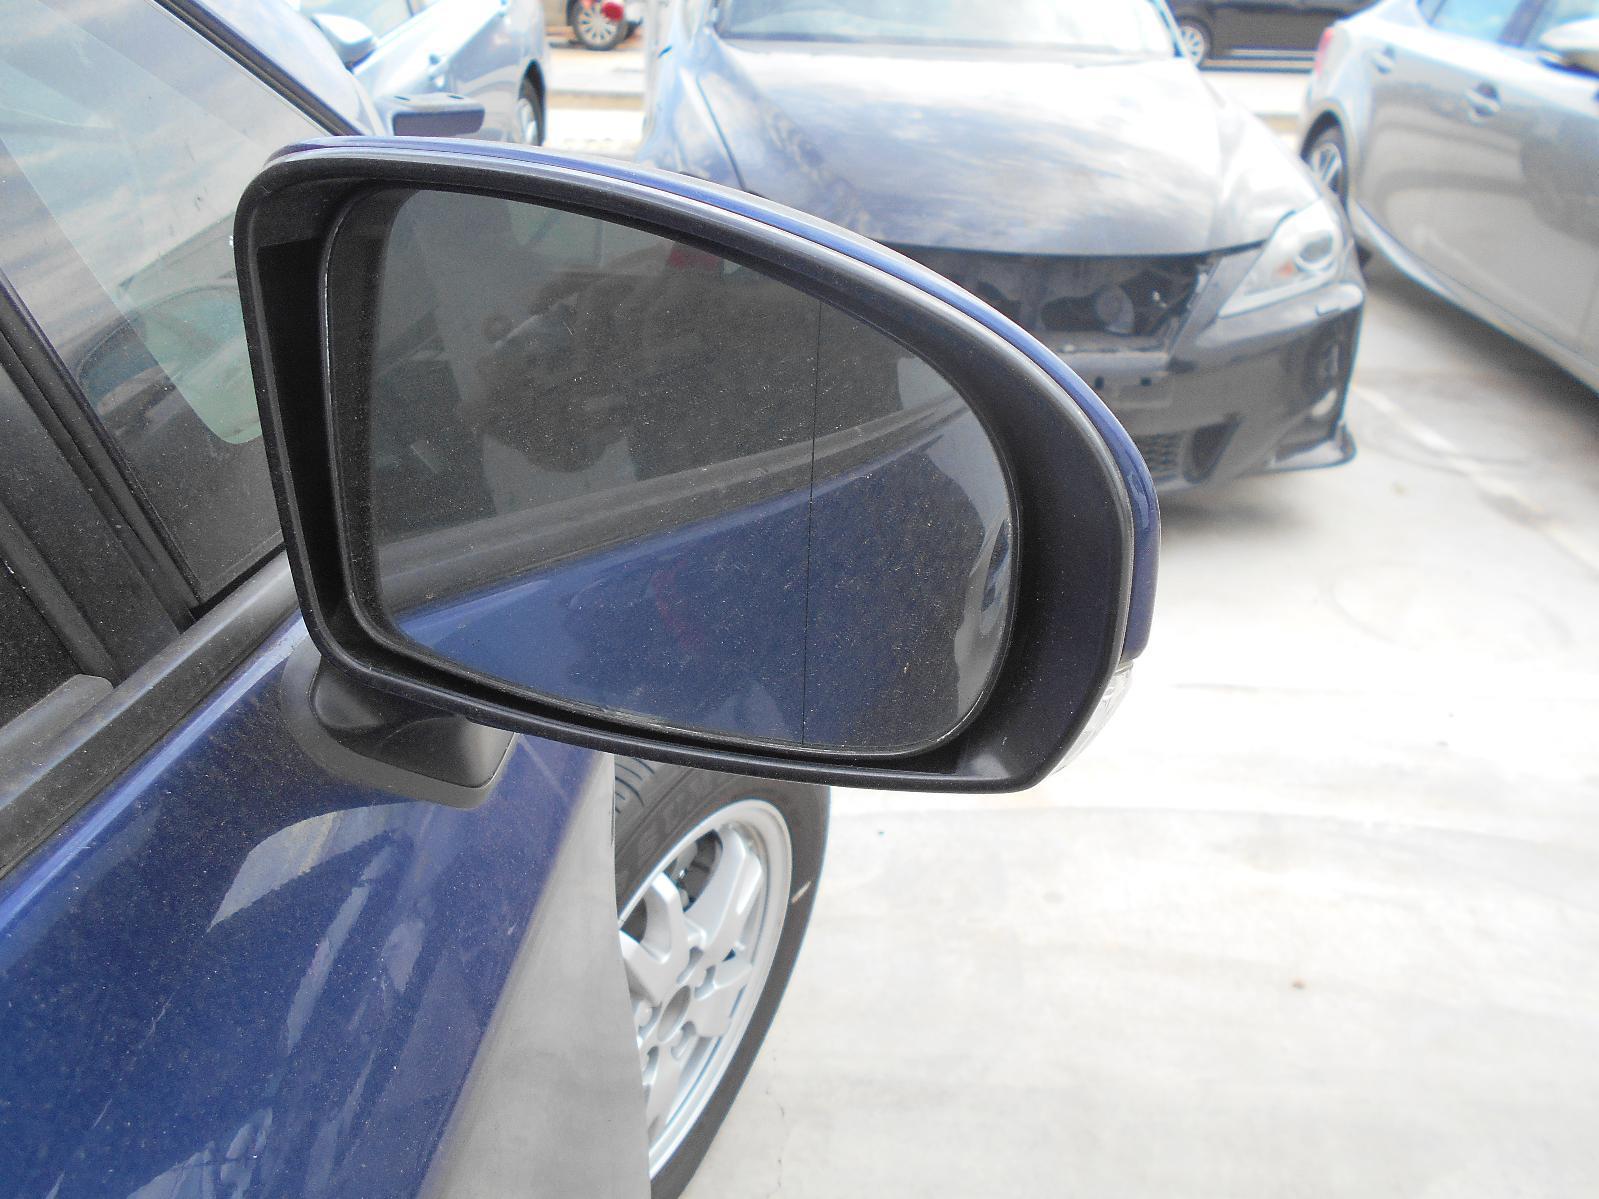 TOYOTA PRIUS, Right Door Mirror, ZVW30R, 06/09-01/12